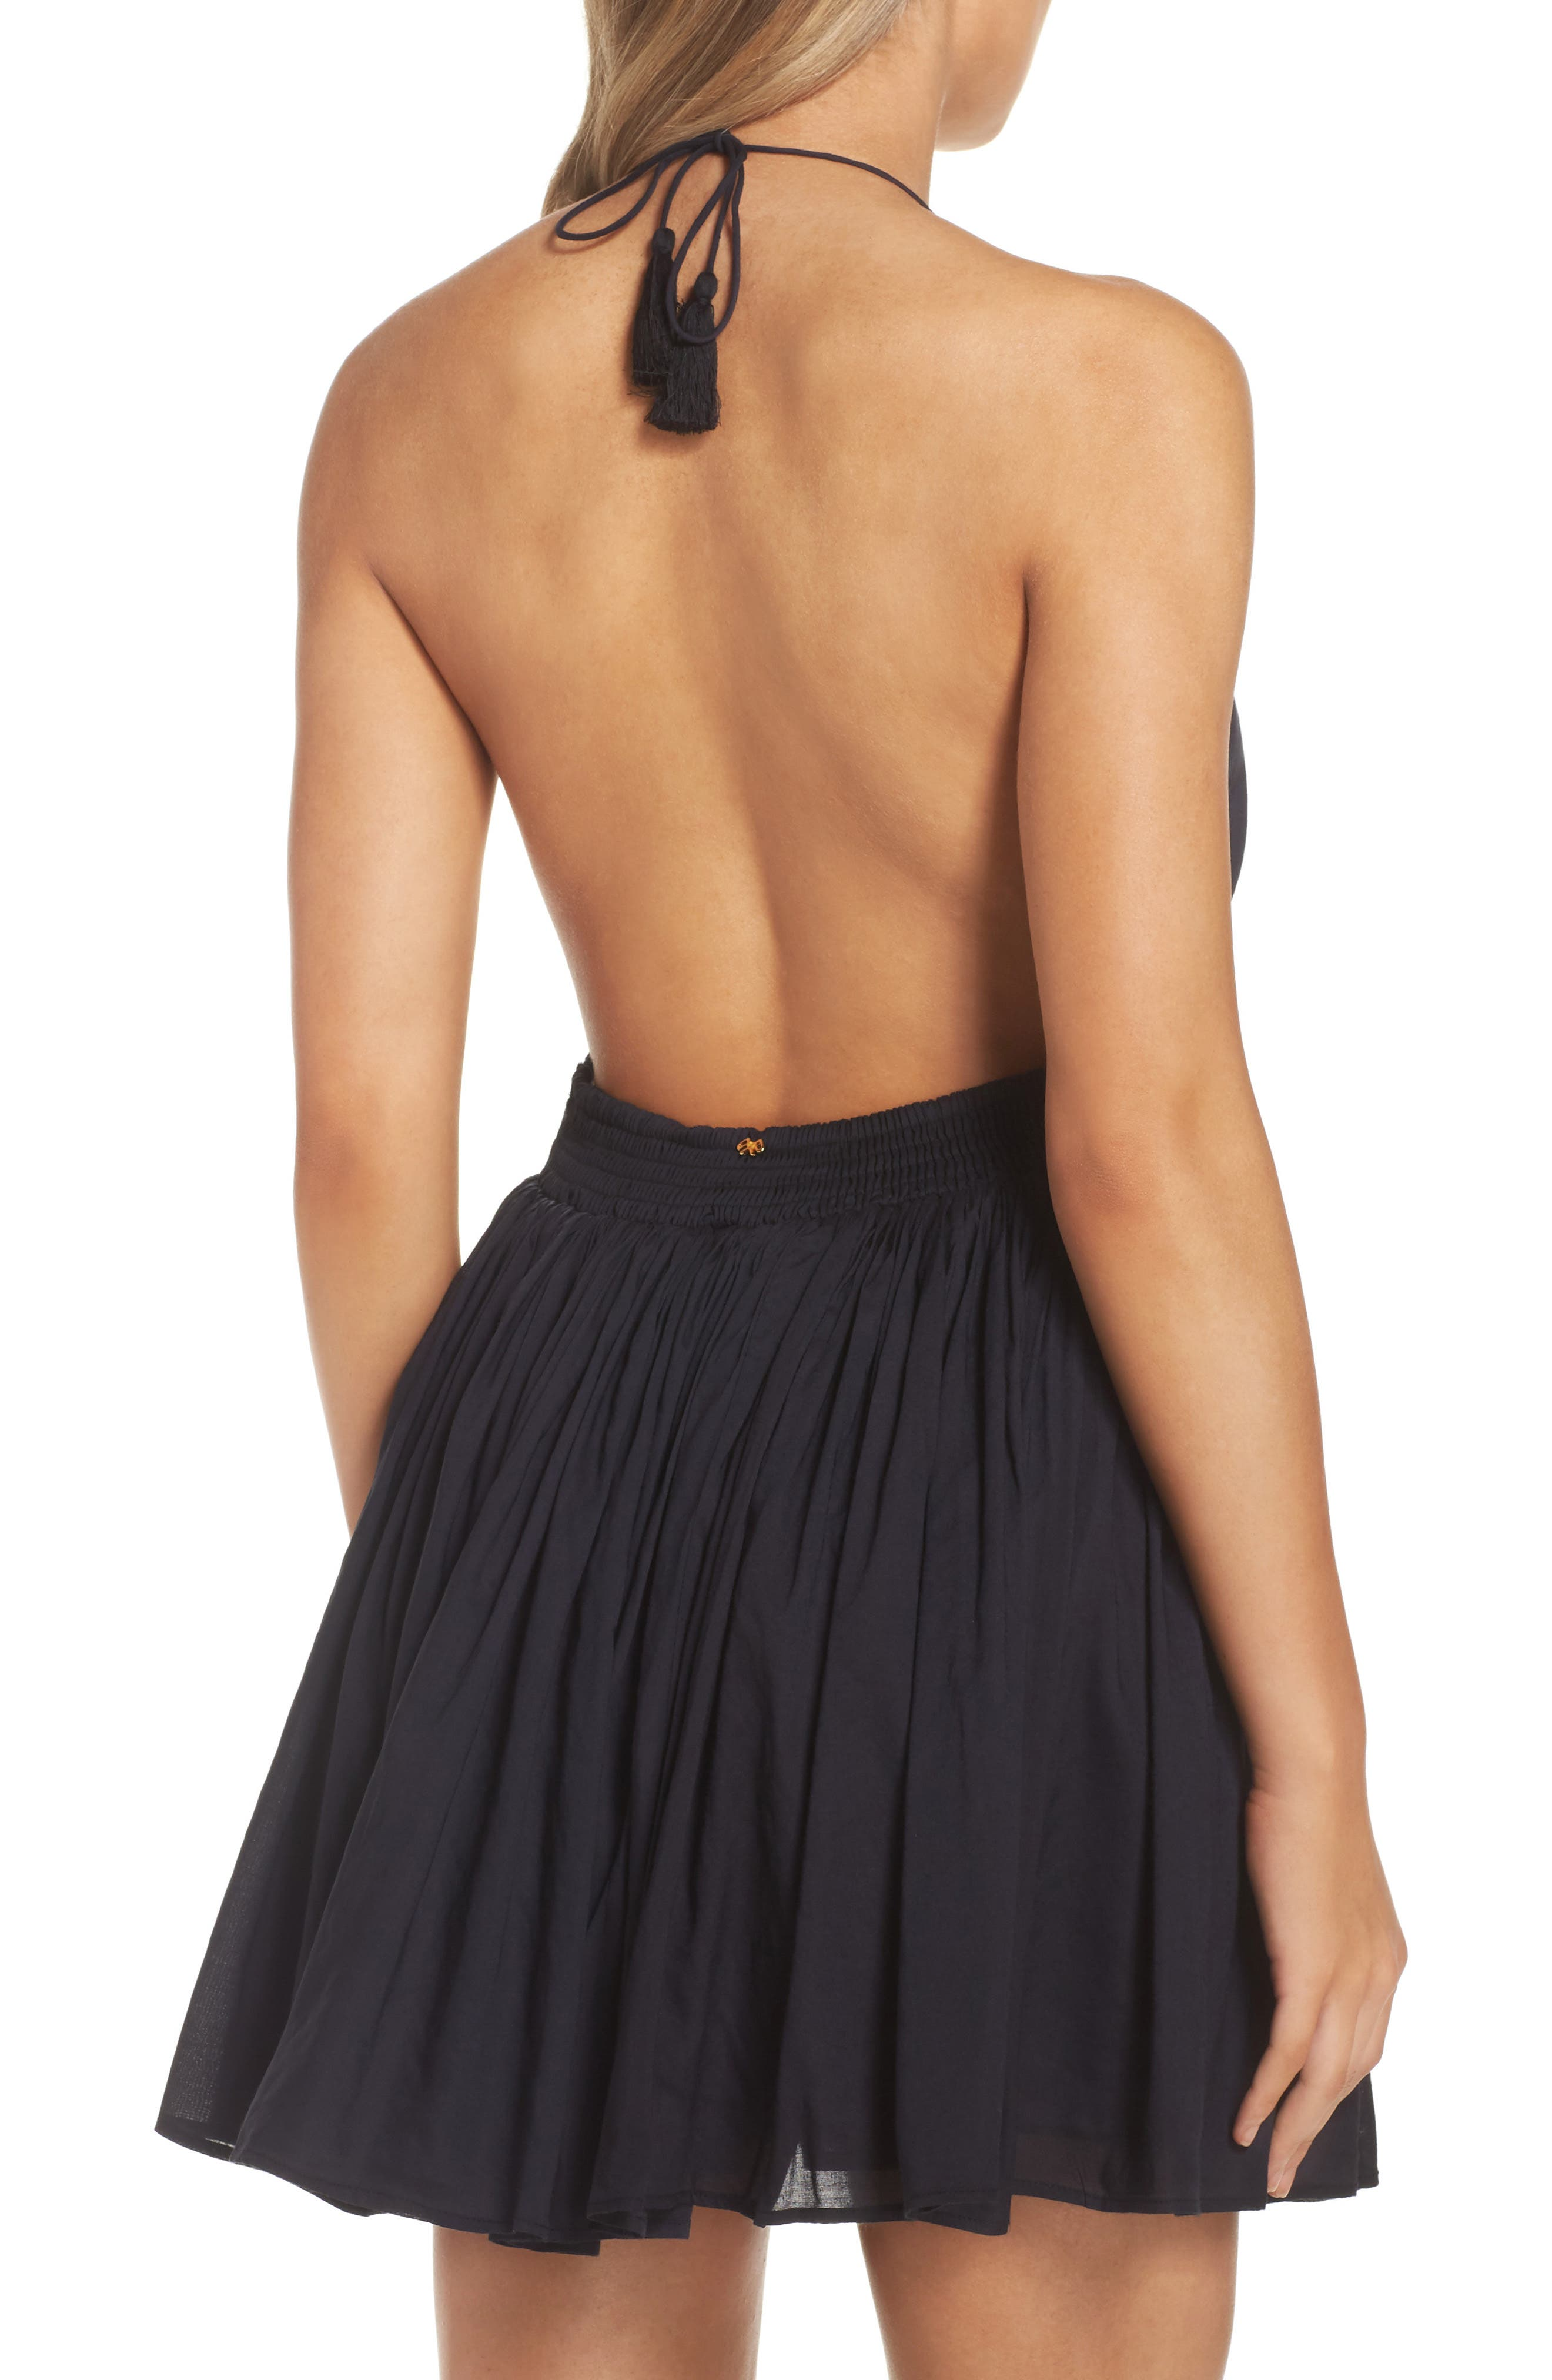 Celeste Cover-Up Dress,                             Alternate thumbnail 2, color,                             001